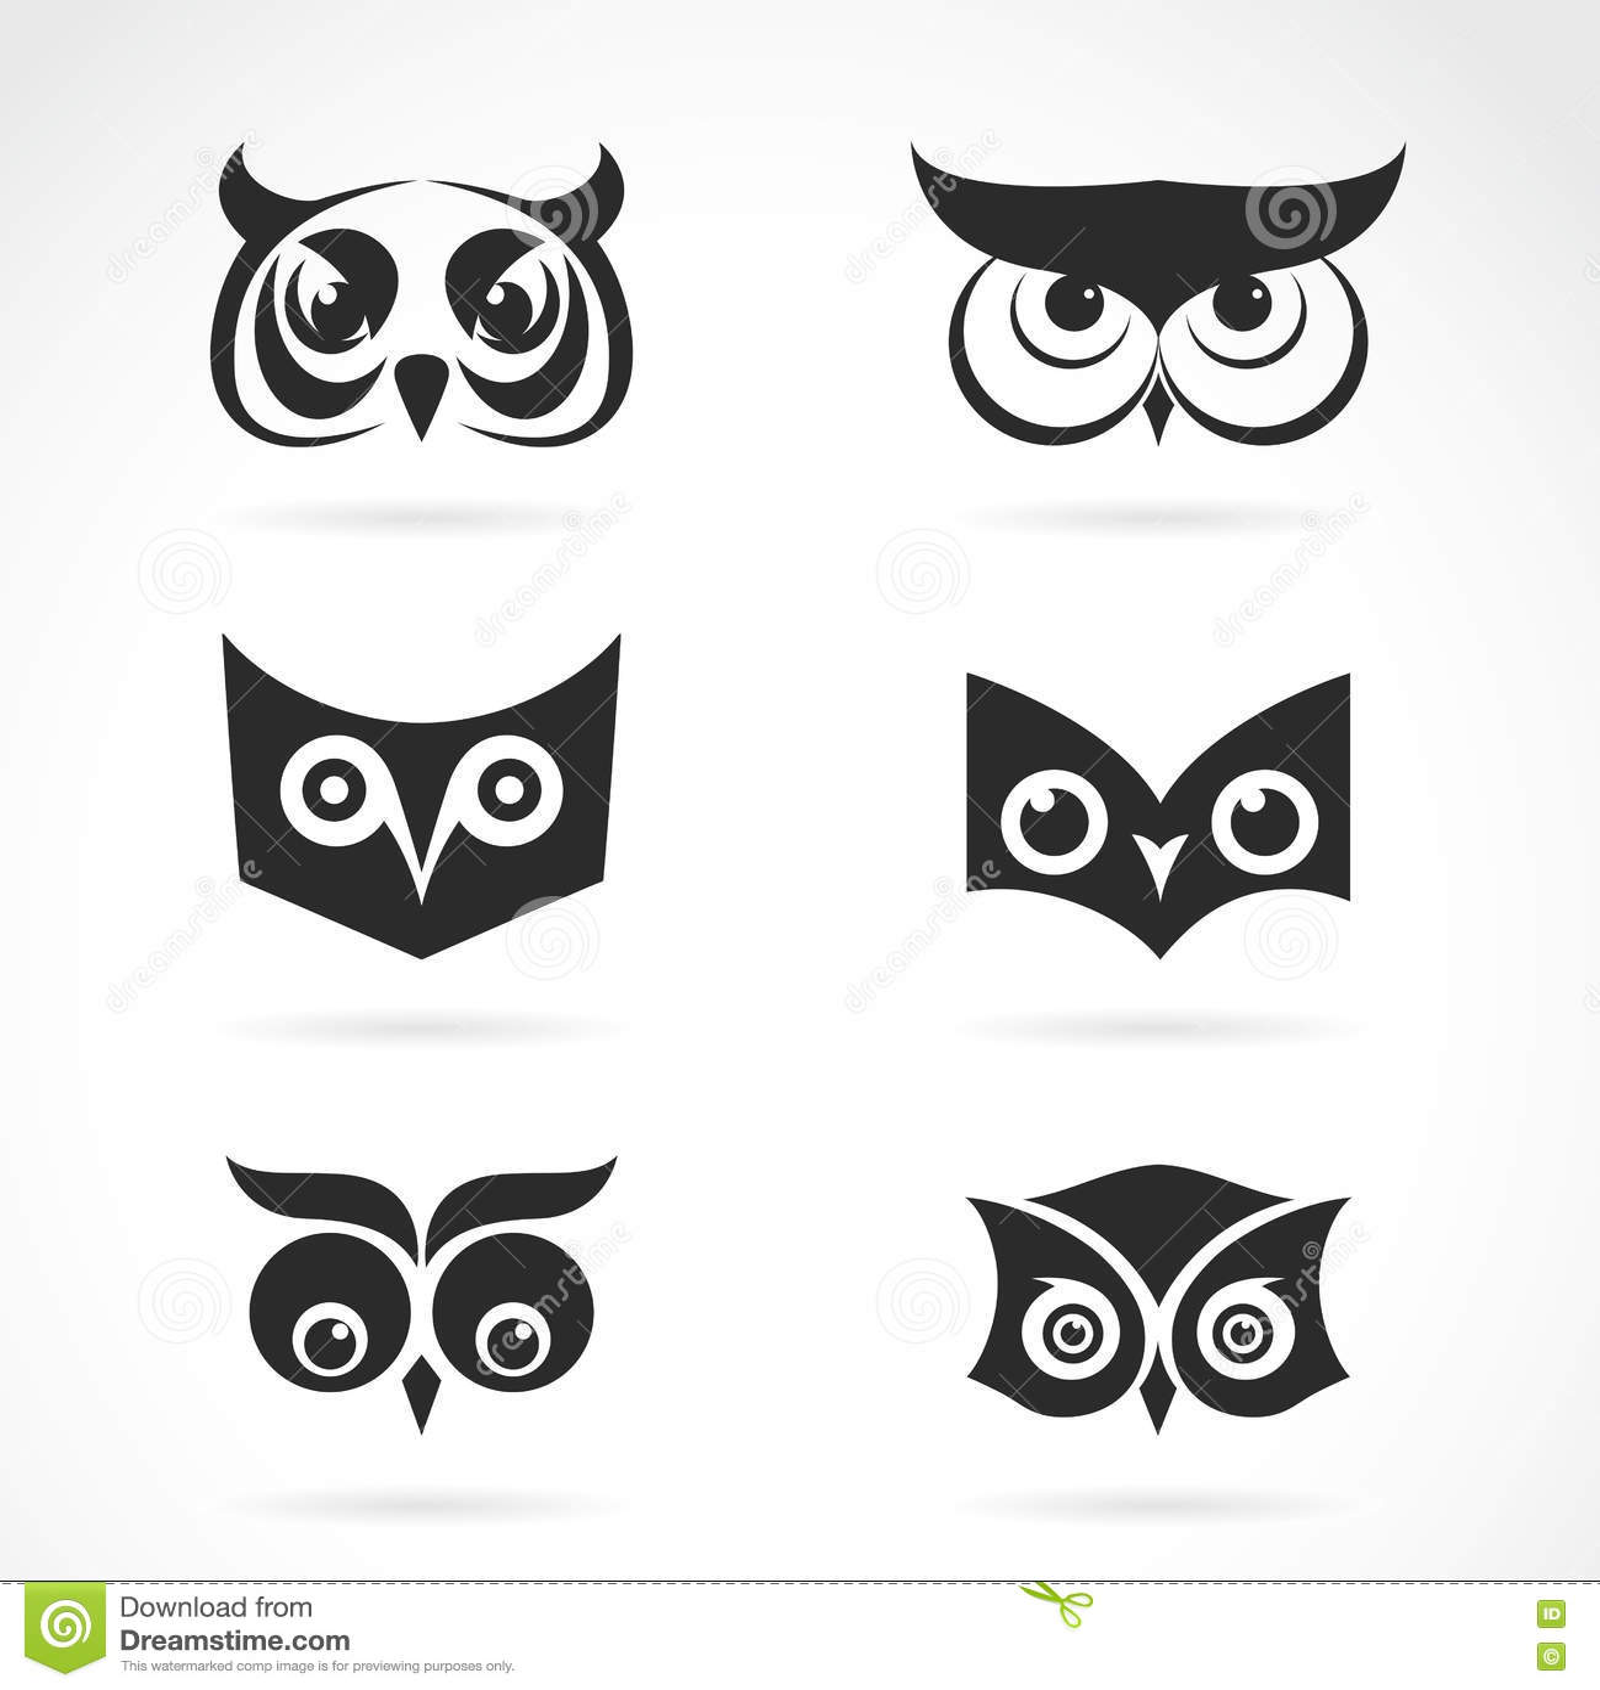 vector image of an owl face design stock vector image Owl Psychedelic Art Owl Psychedelic Art